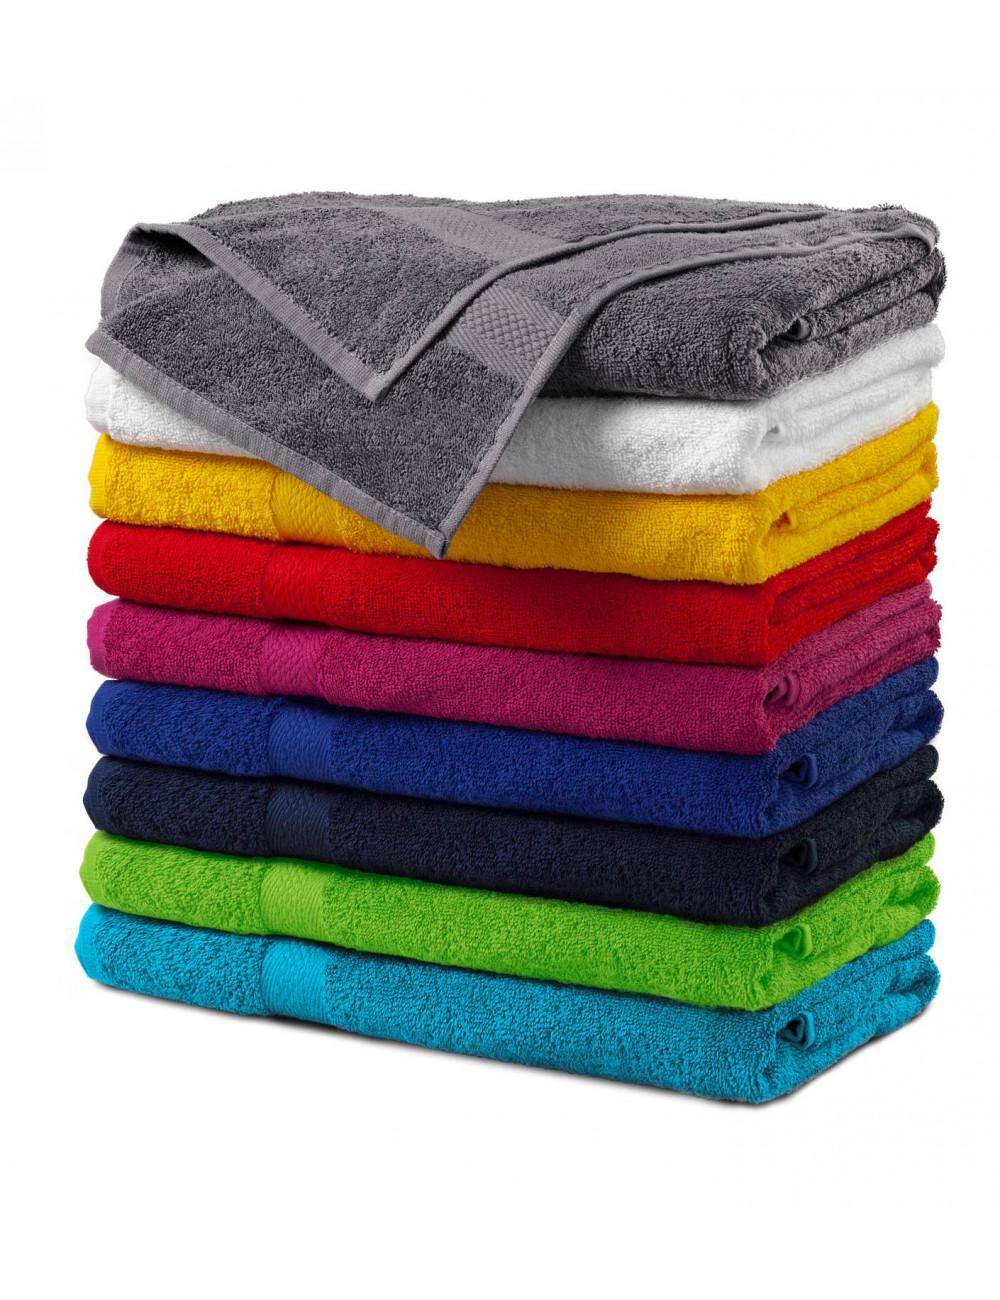 Adler MALFINI Ręcznik duży unisex Terry Bath Towel 905 green apple